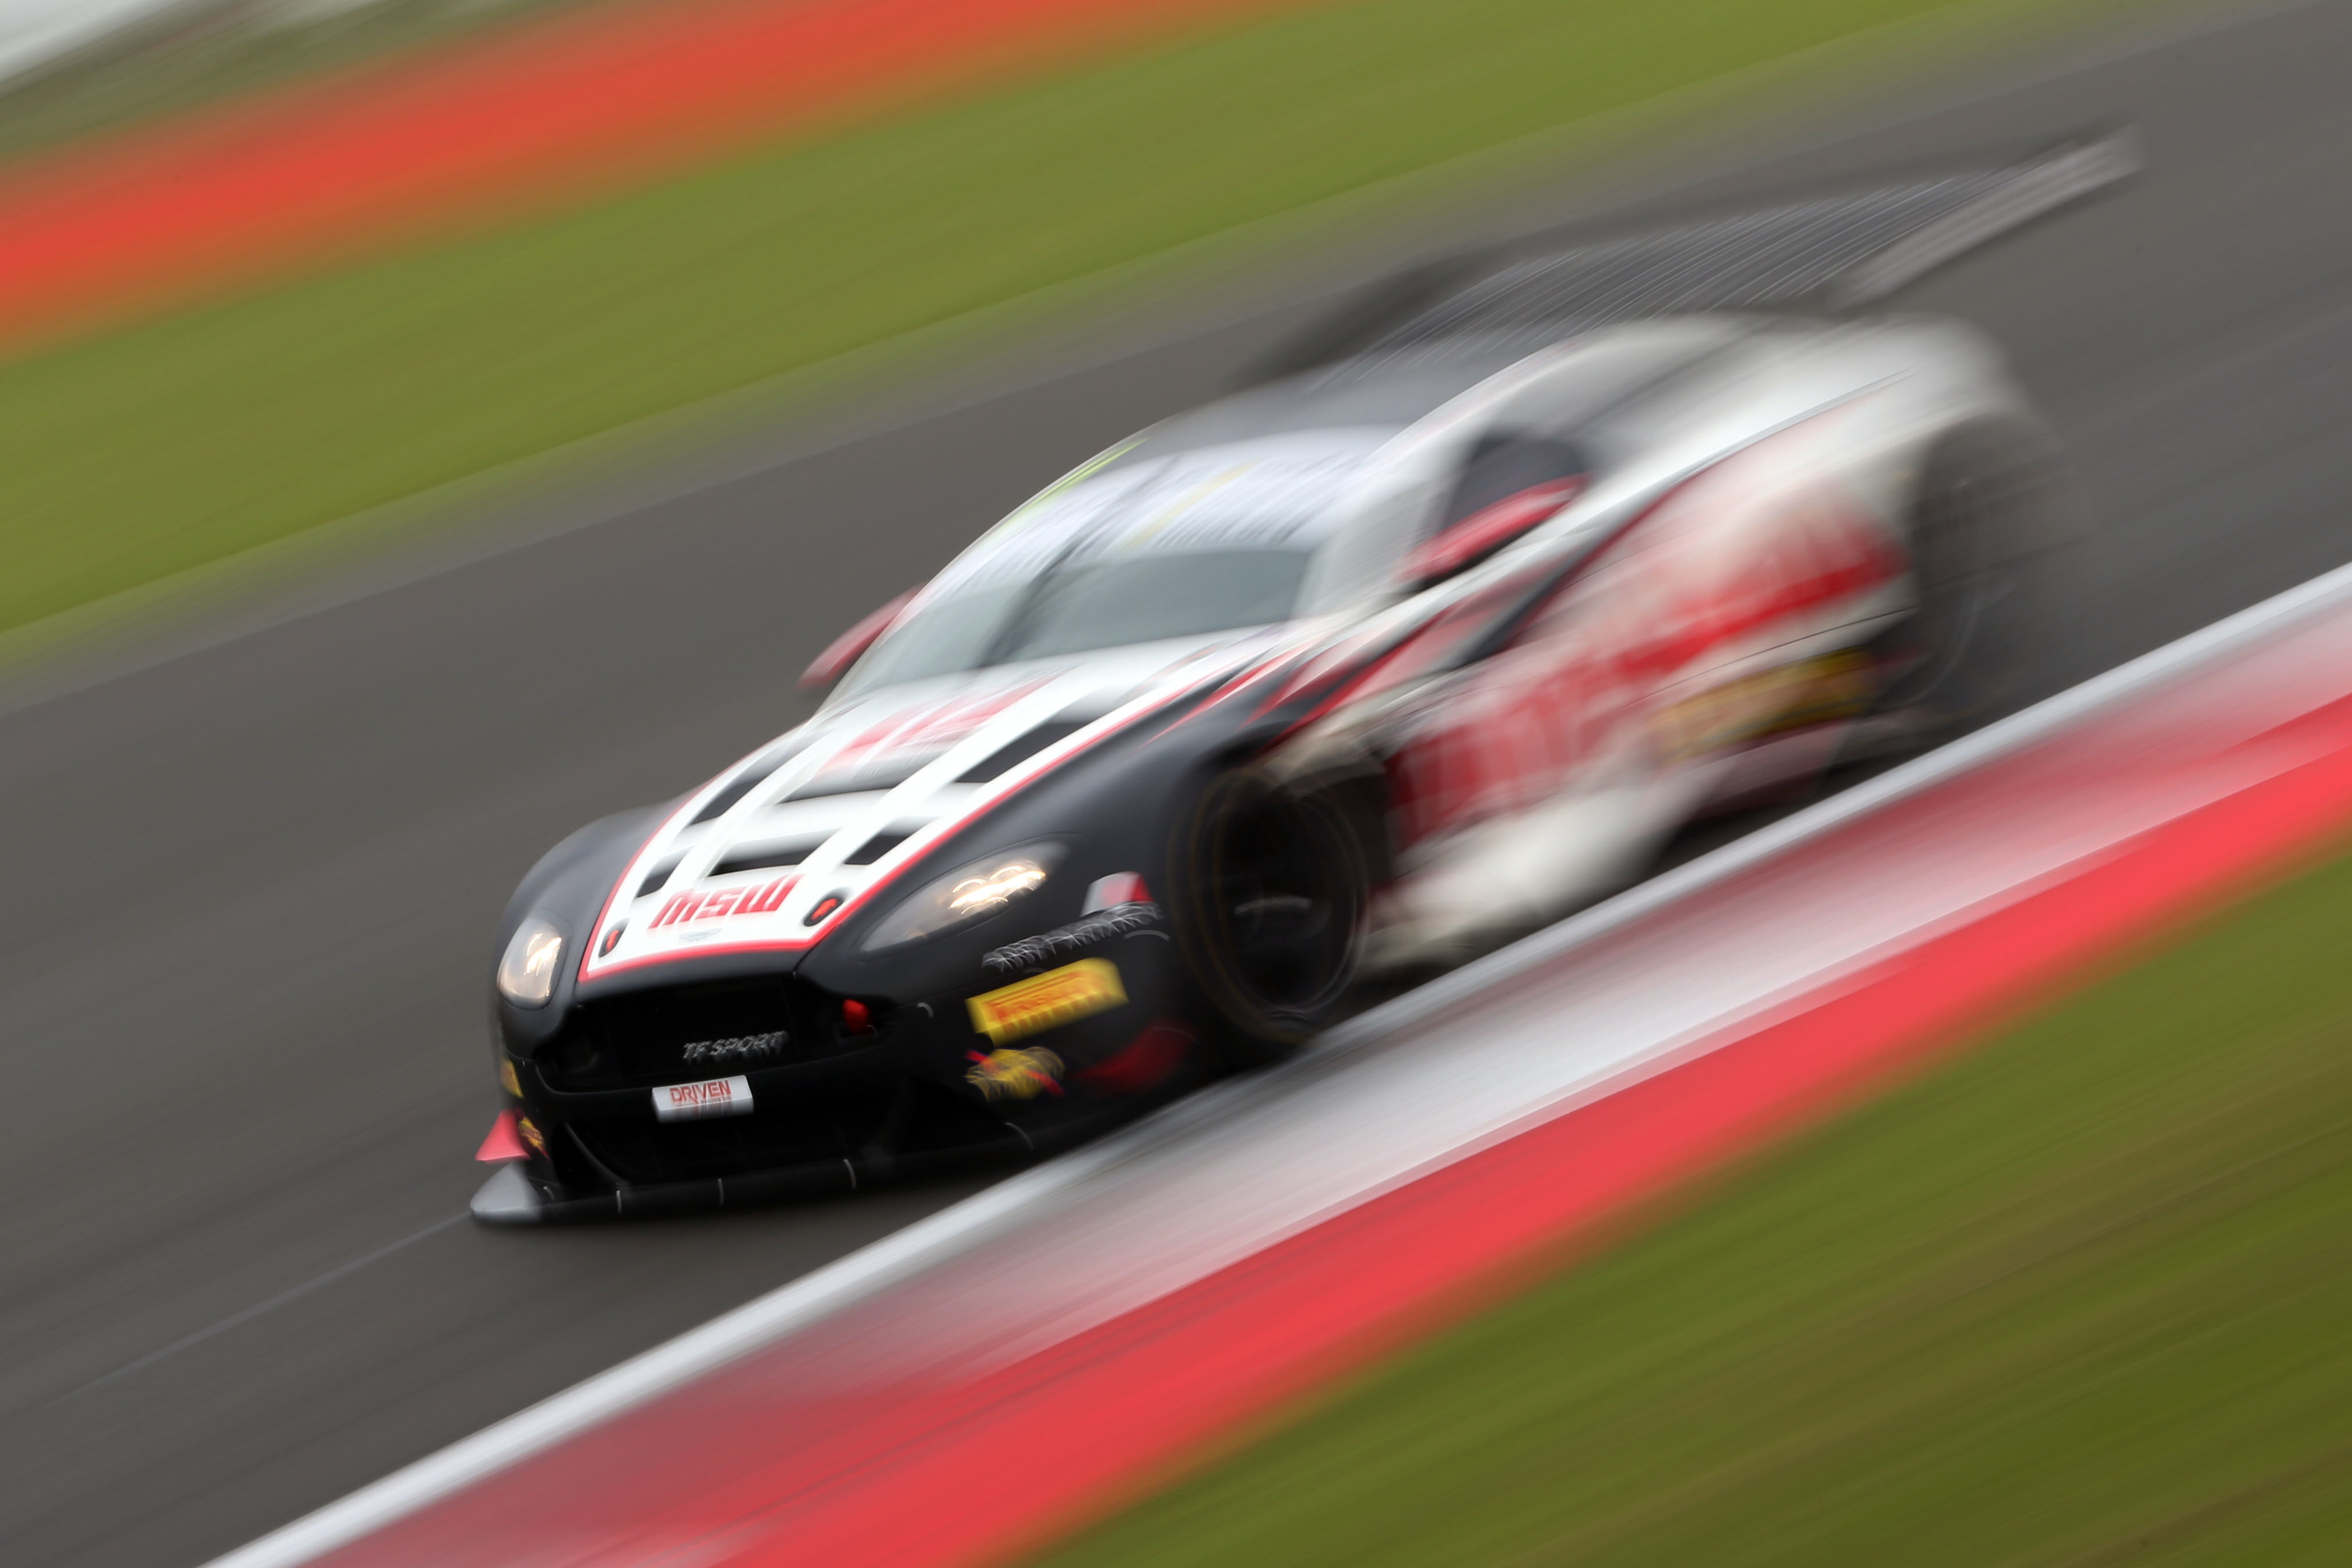 The TF Sport #17 Aston Martin